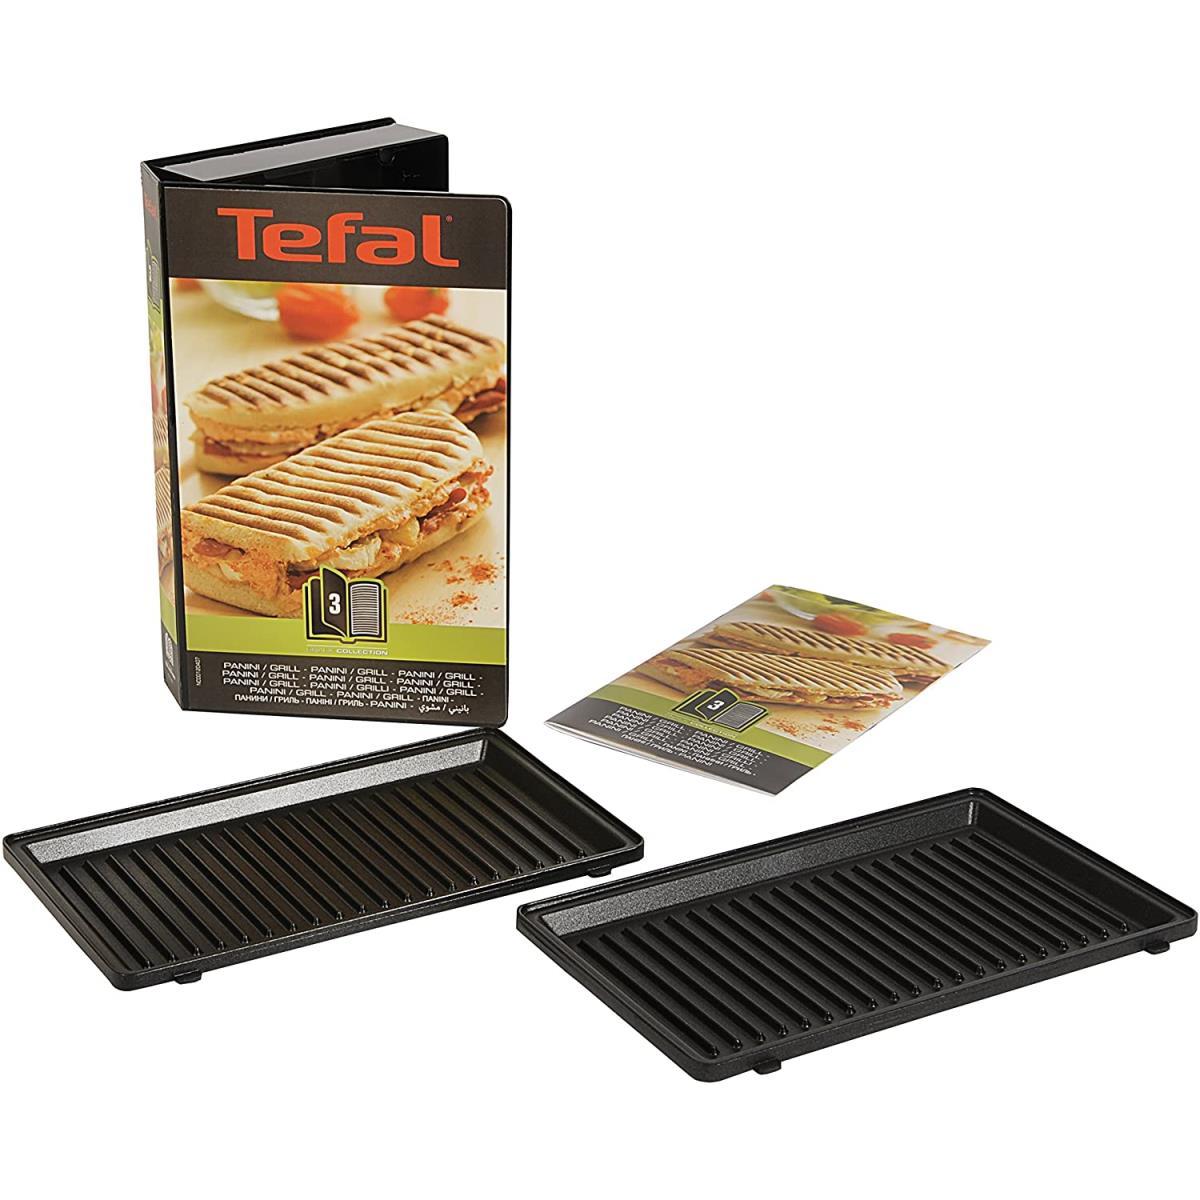 Tefal XA800312 Snack Collection Platte Grill Panini Nummer 3 für Waffeleisen,Tefal ,XA800312, 3045386366163